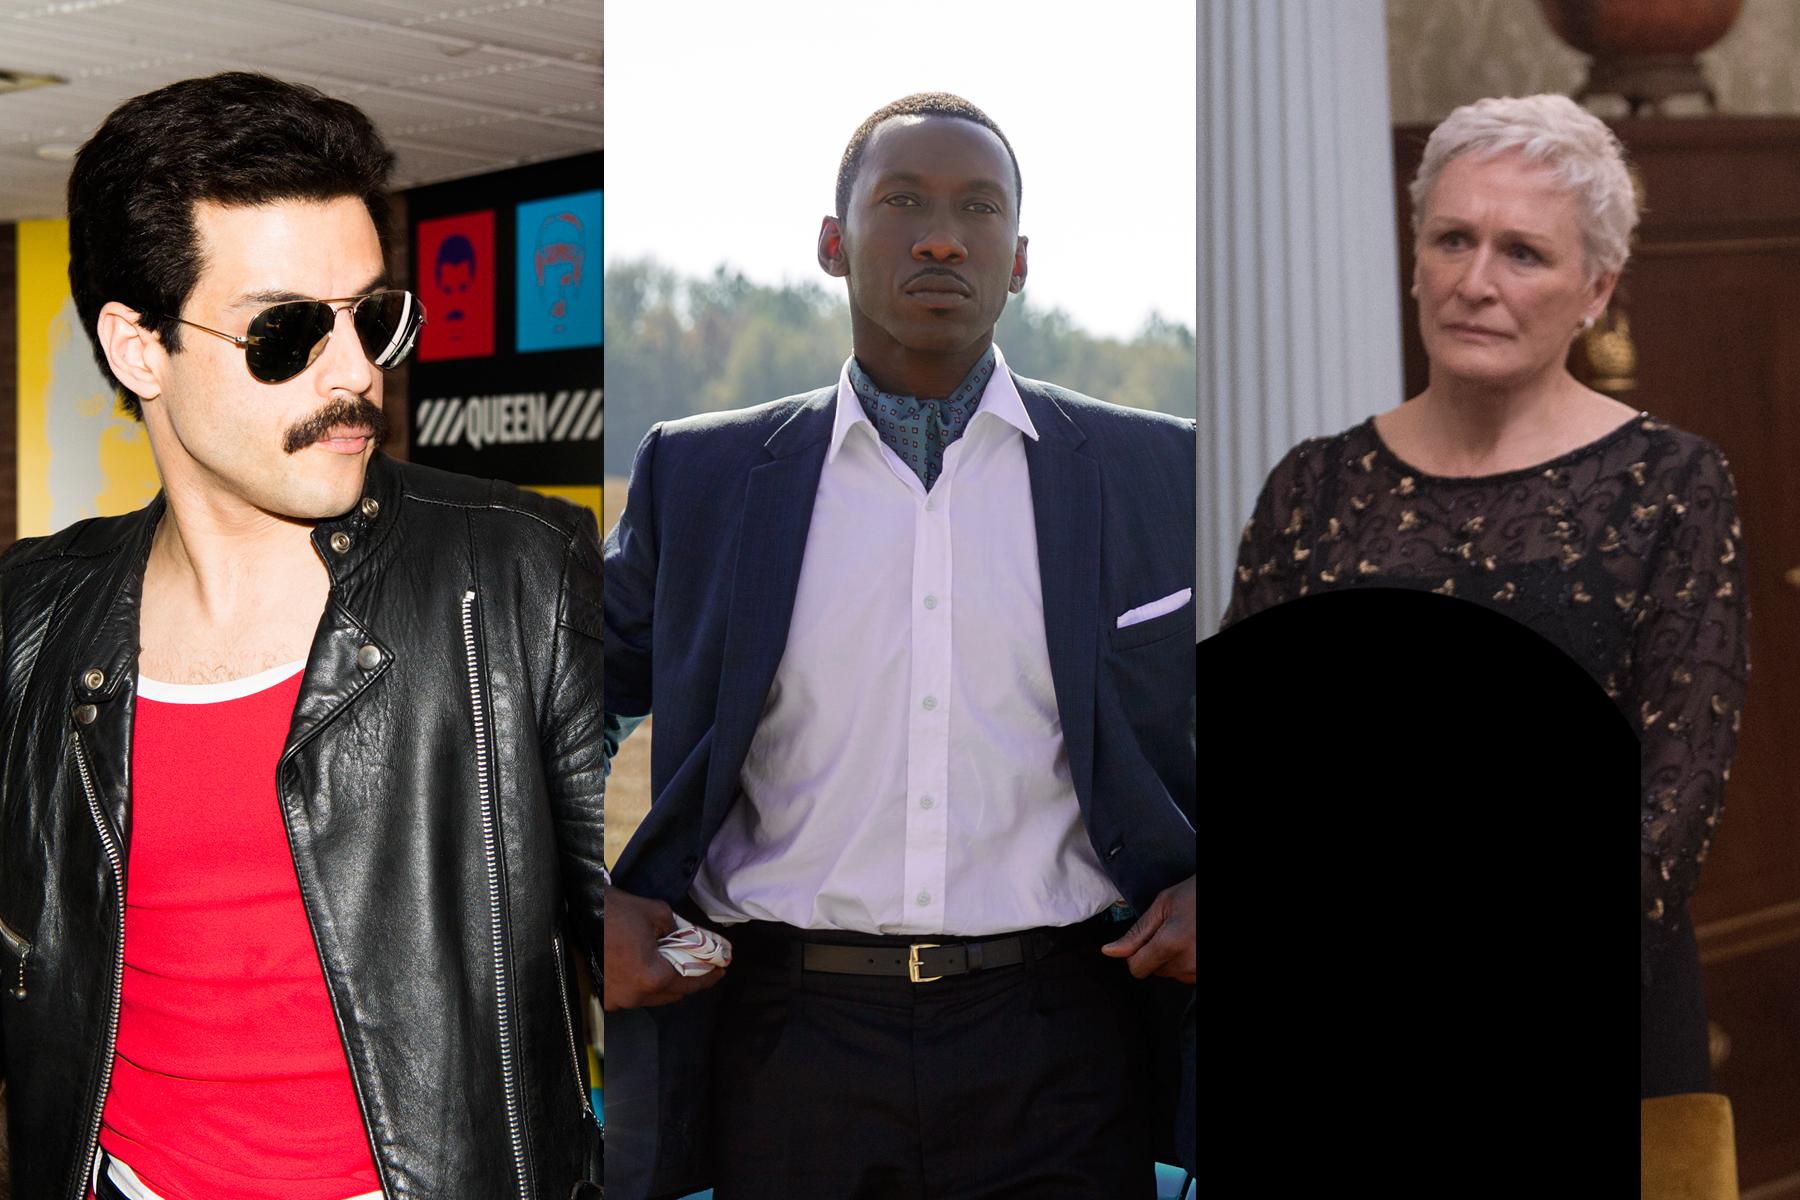 Oscars 2019: Who Should Win, Who Will Win